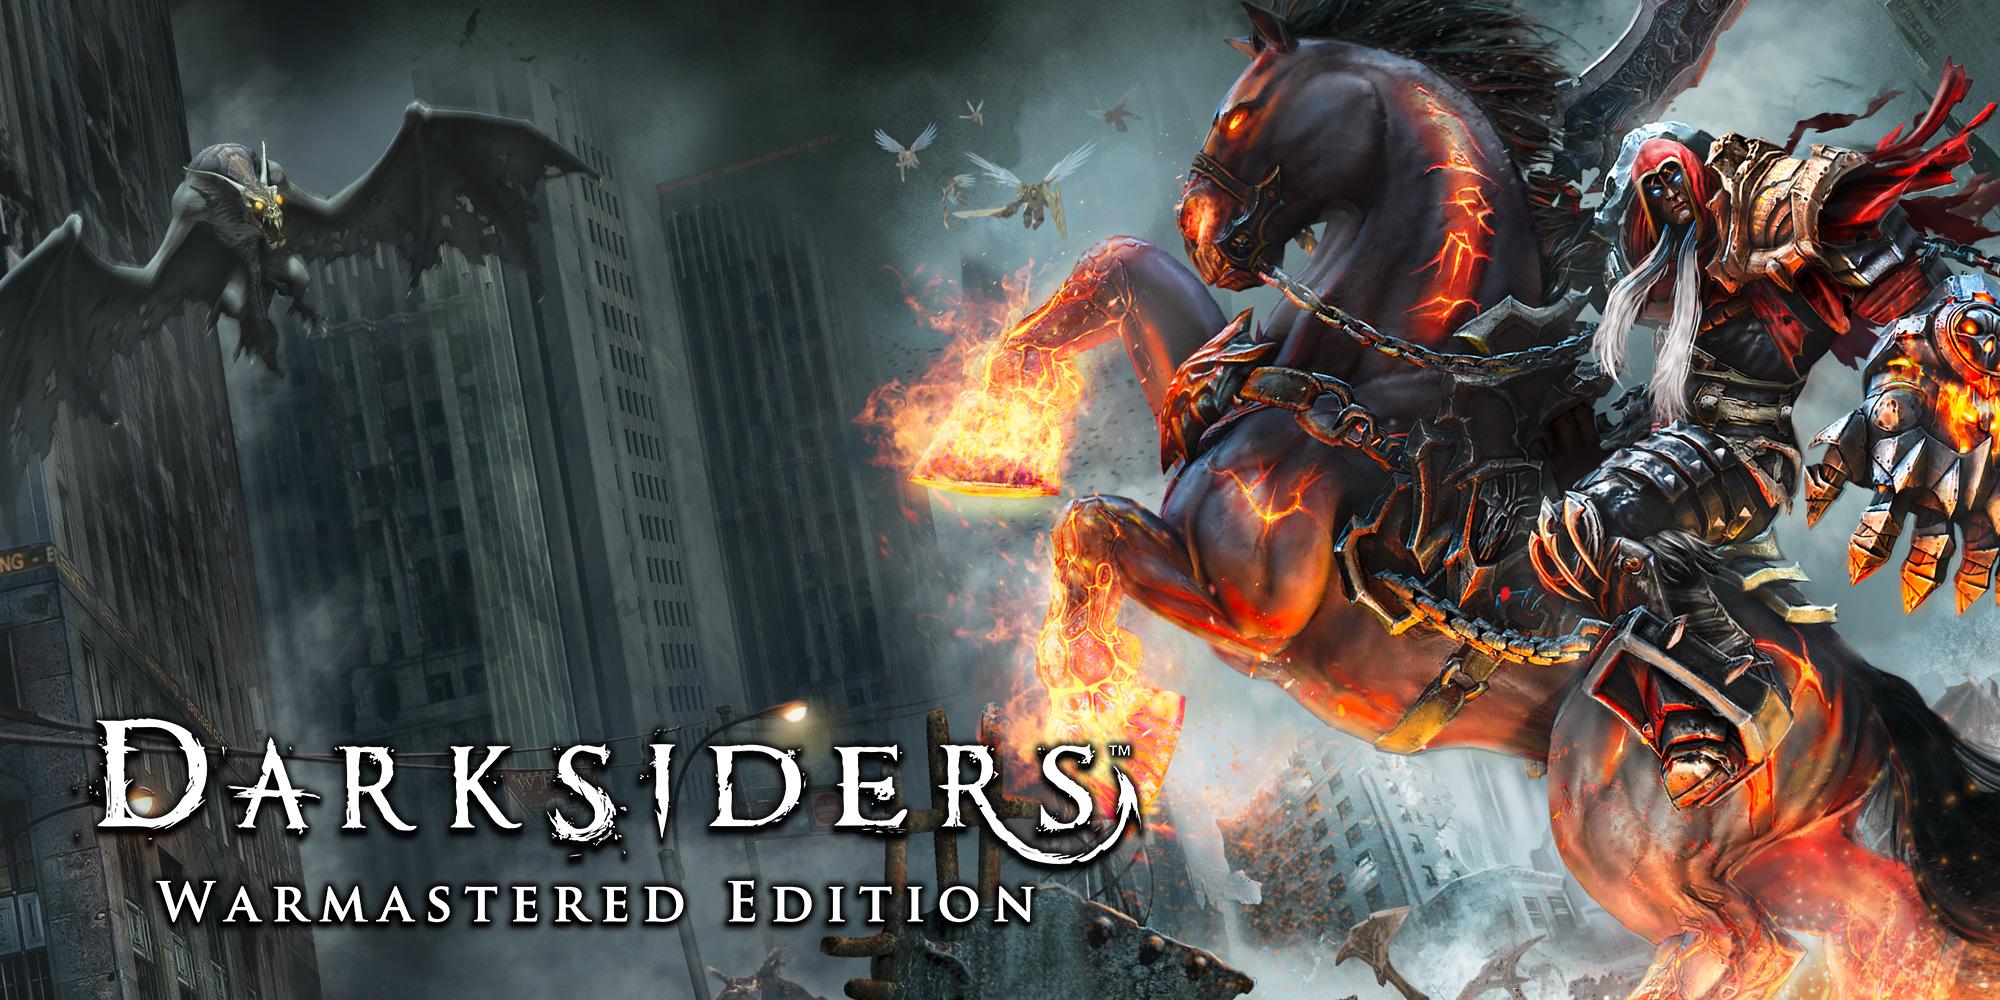 darksiders warmastered edition wii u games nintendo